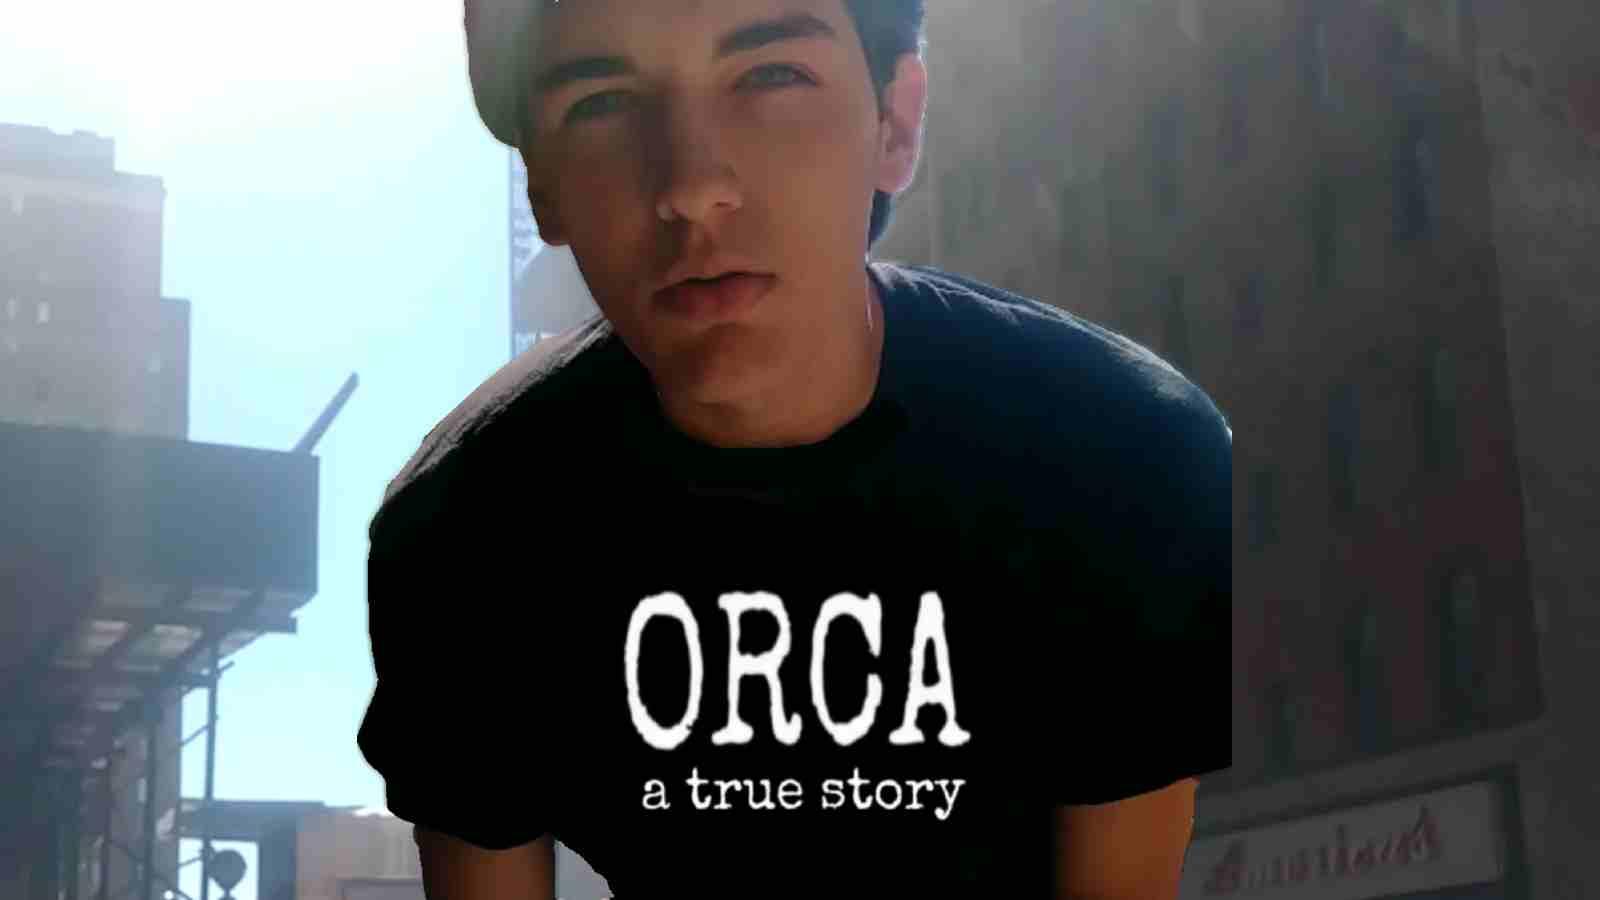 Orca: A True Story (2017)